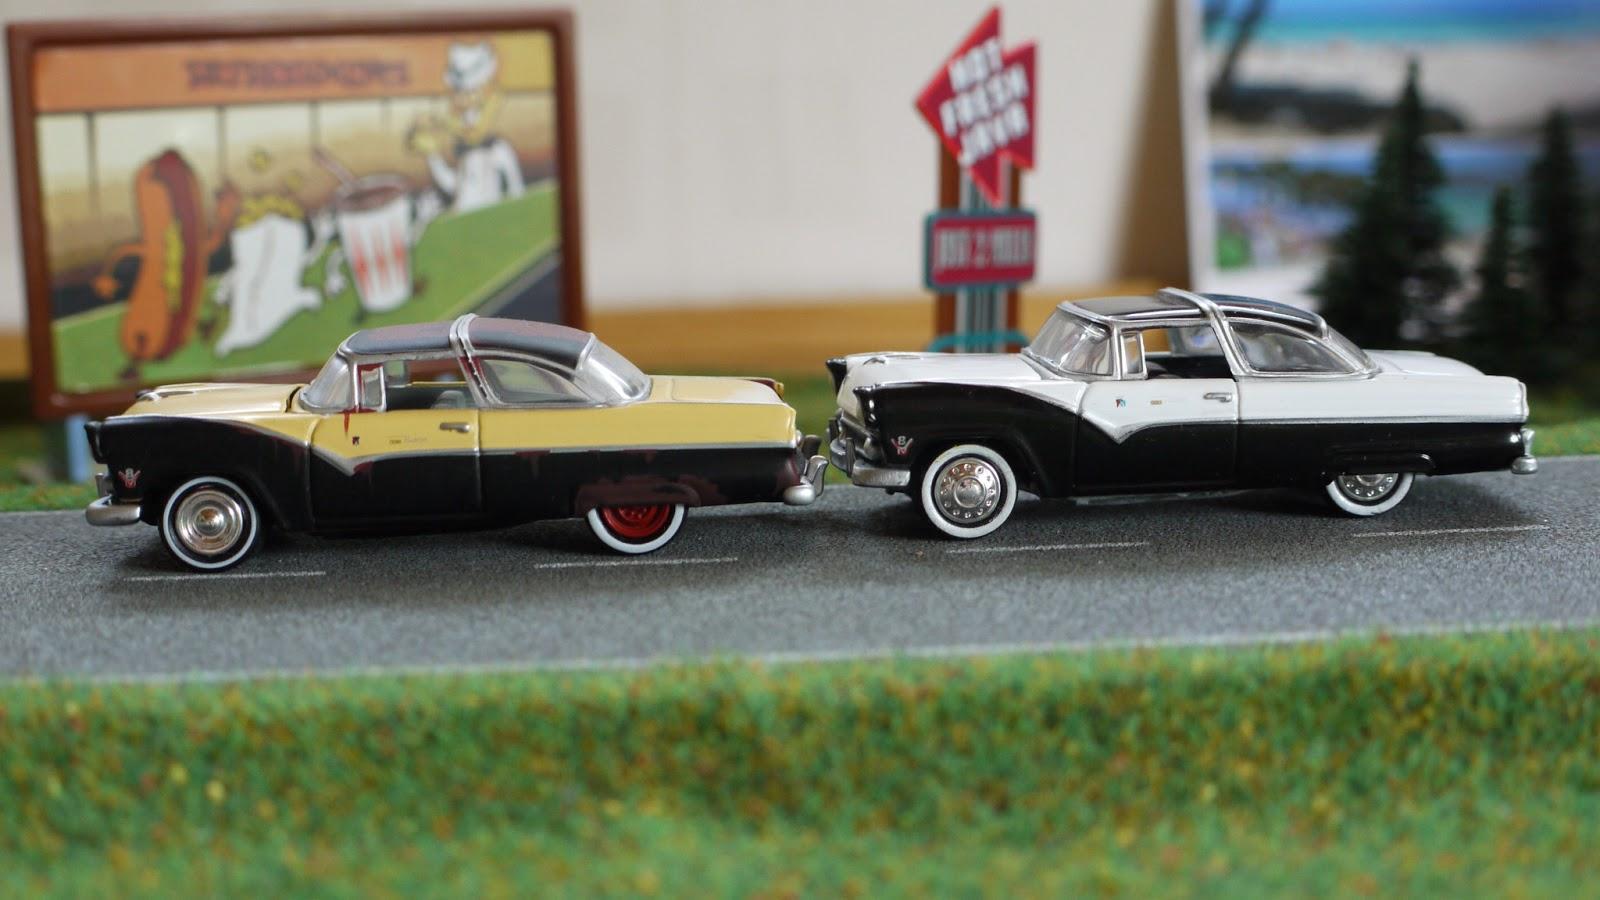 Diecast Cars 1 64 Modellautos 164 Modellbilar 1955 Ford F100 Vector 1956 Crown Victoria Hot Wheels